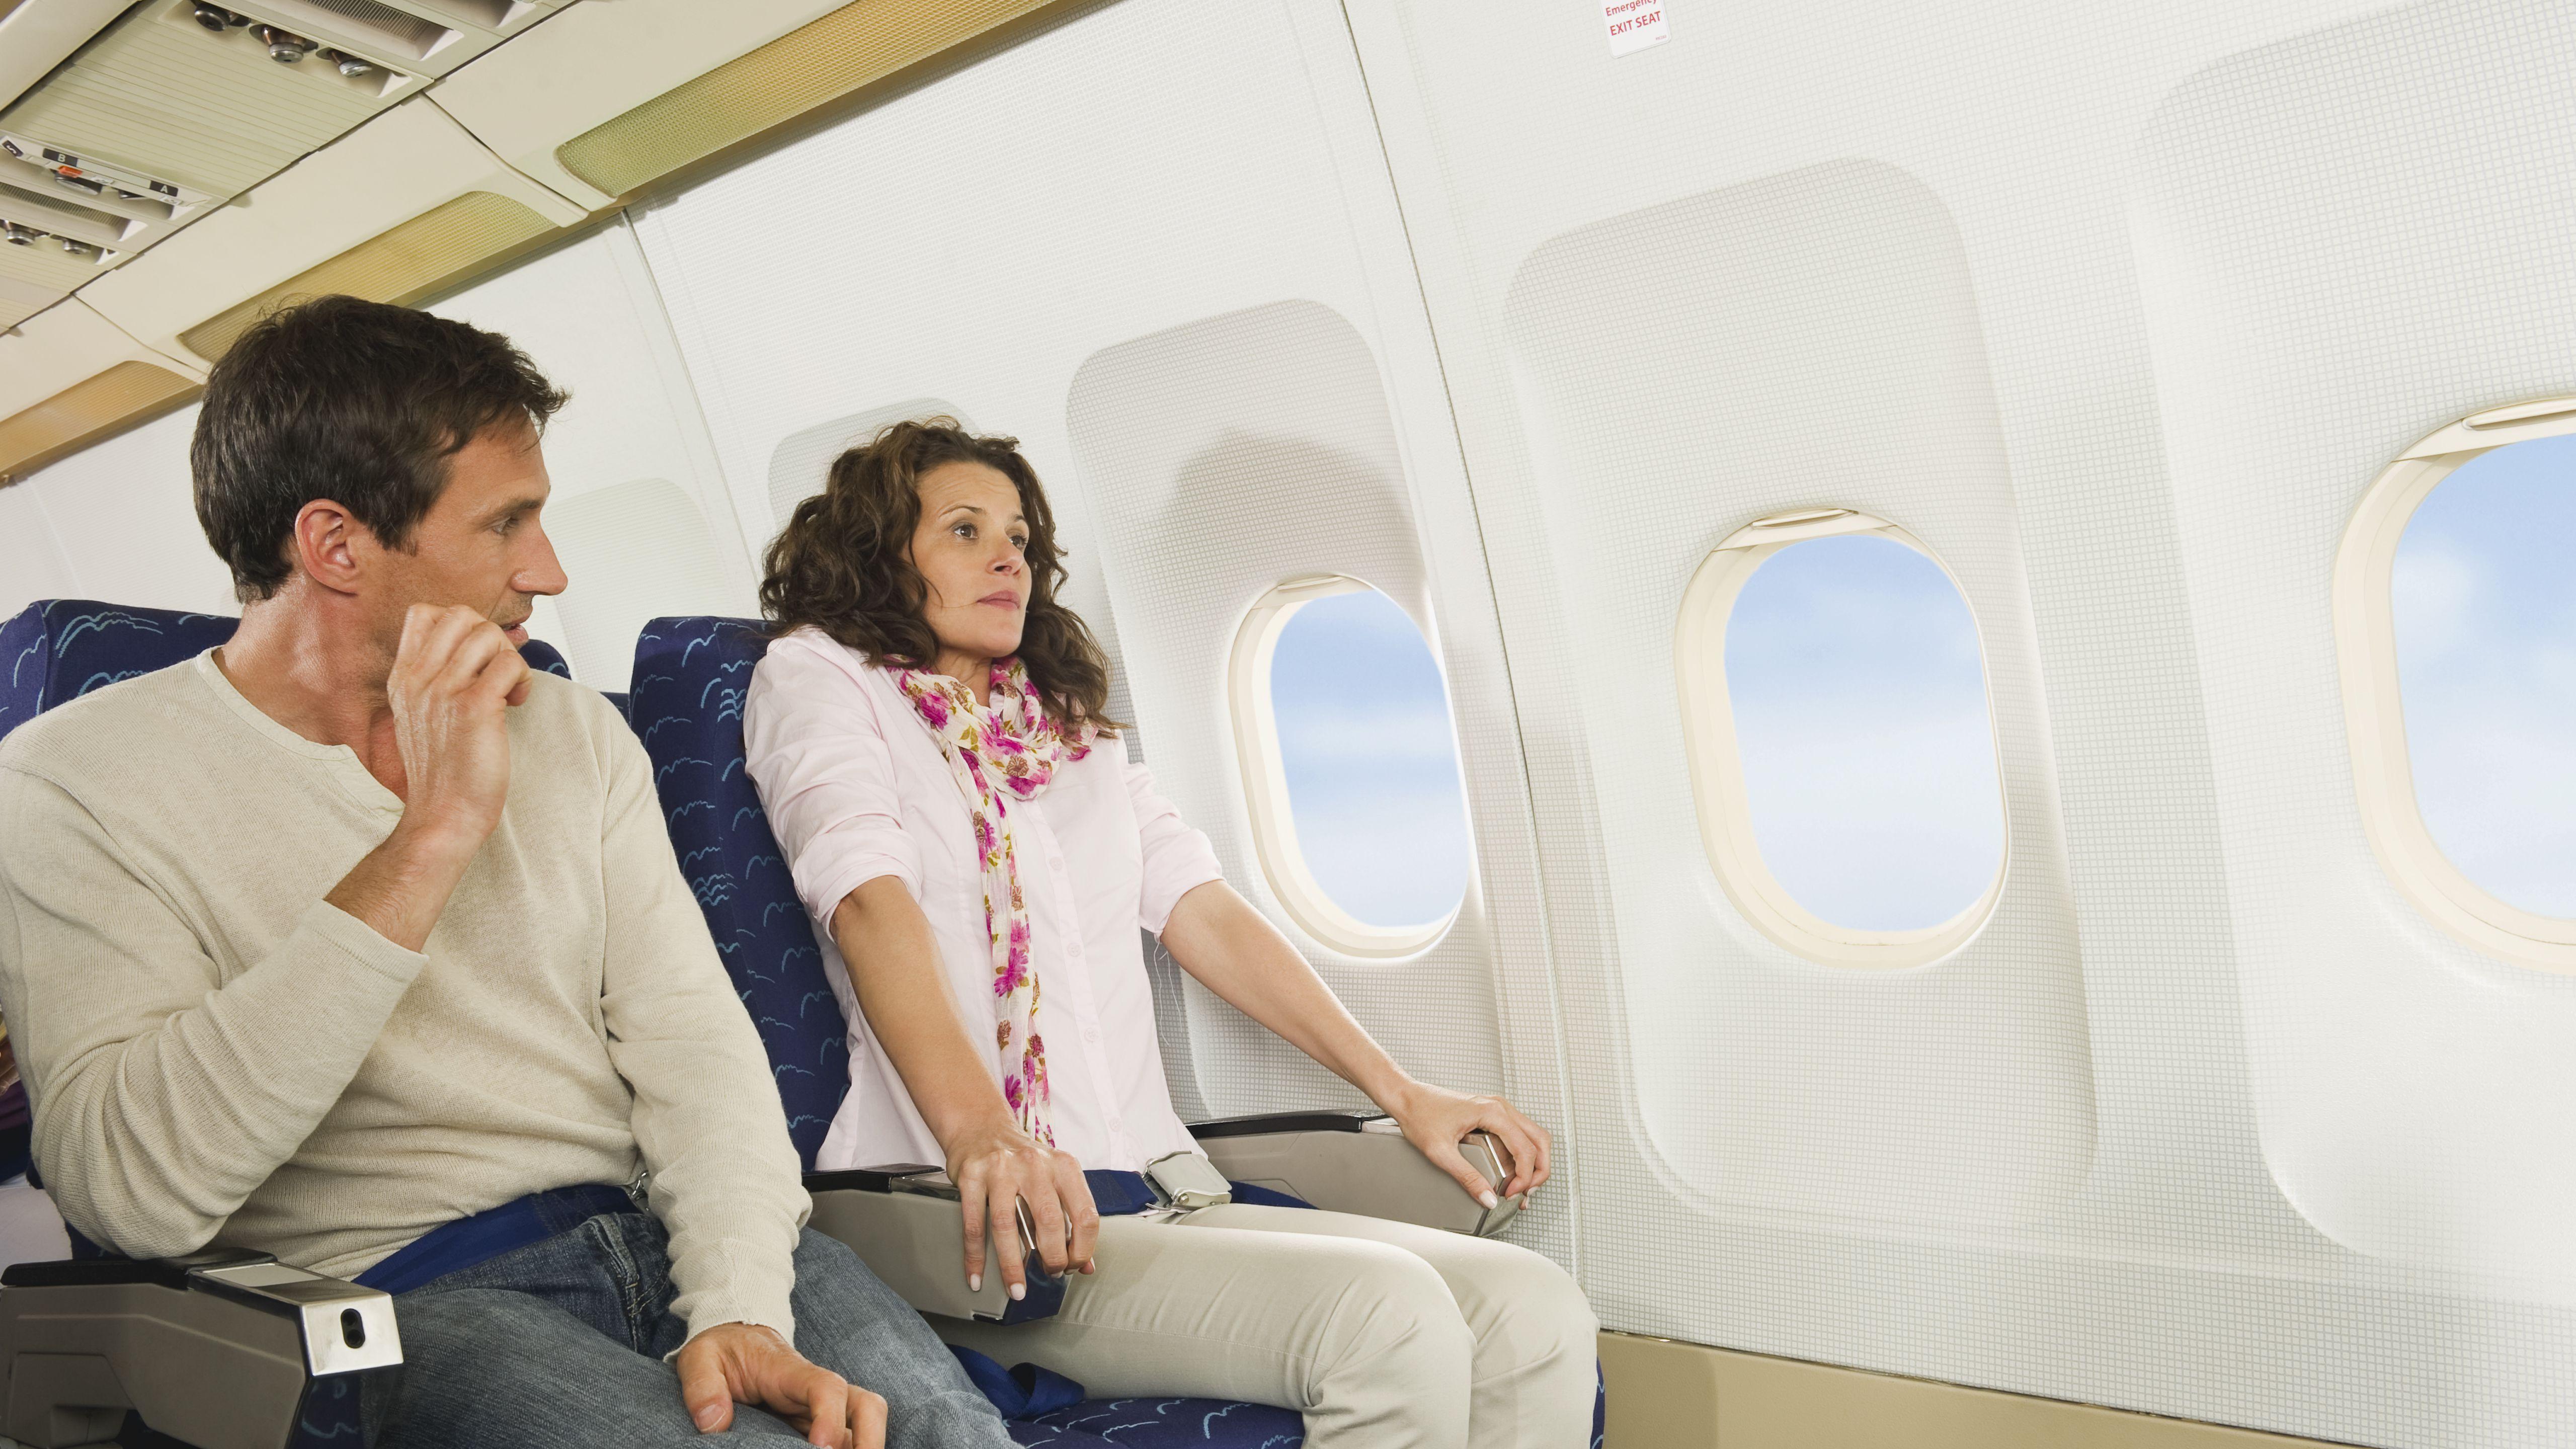 Managing Panic Attacks While Flying